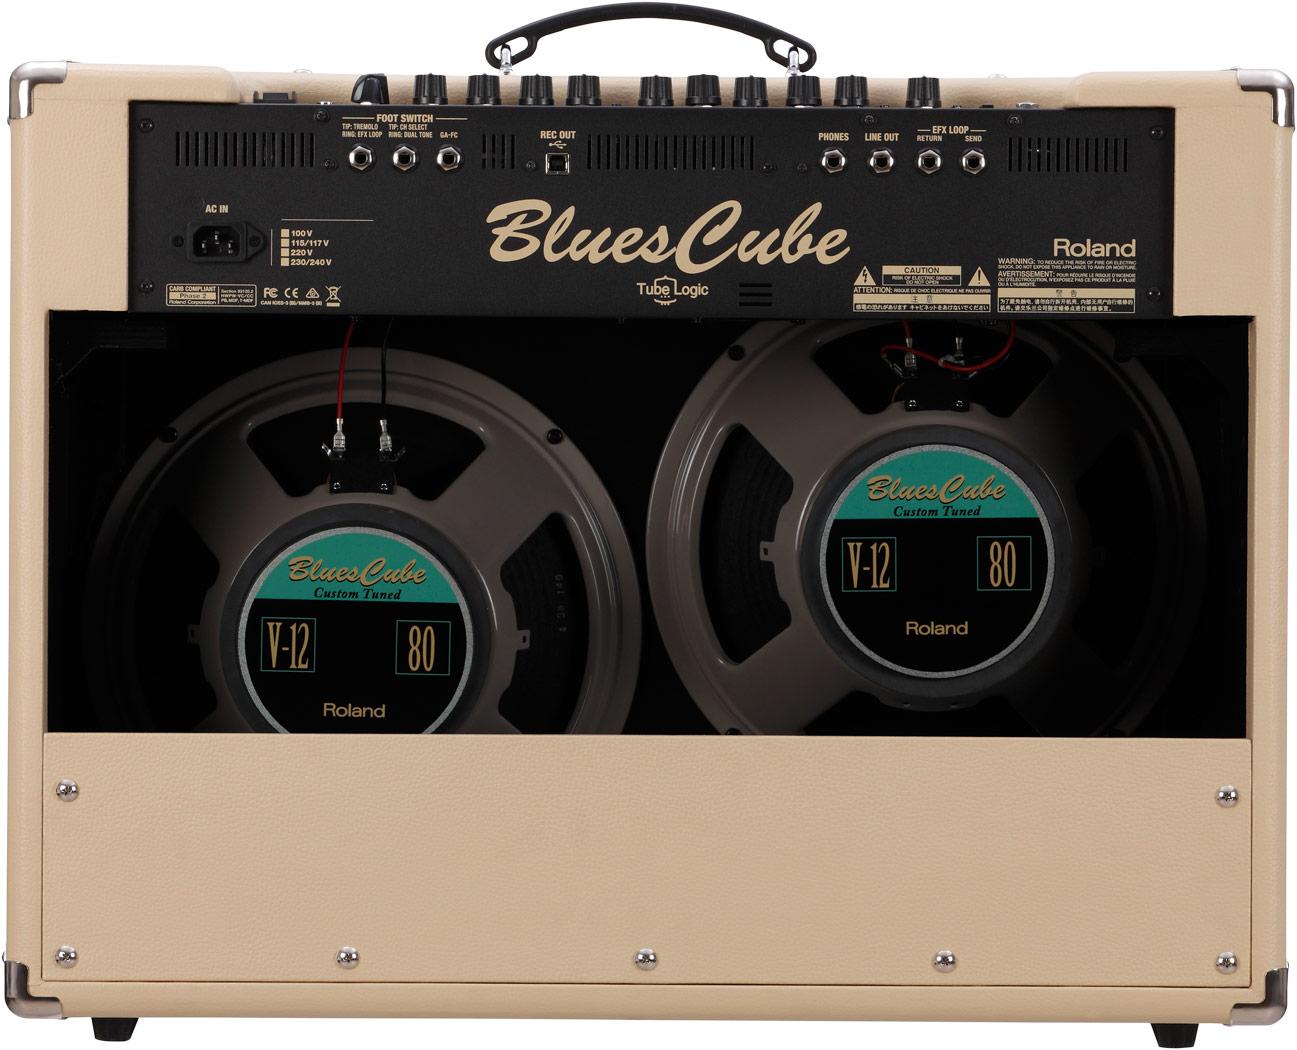 roland blues cube artist212 guitar amplifier. Black Bedroom Furniture Sets. Home Design Ideas